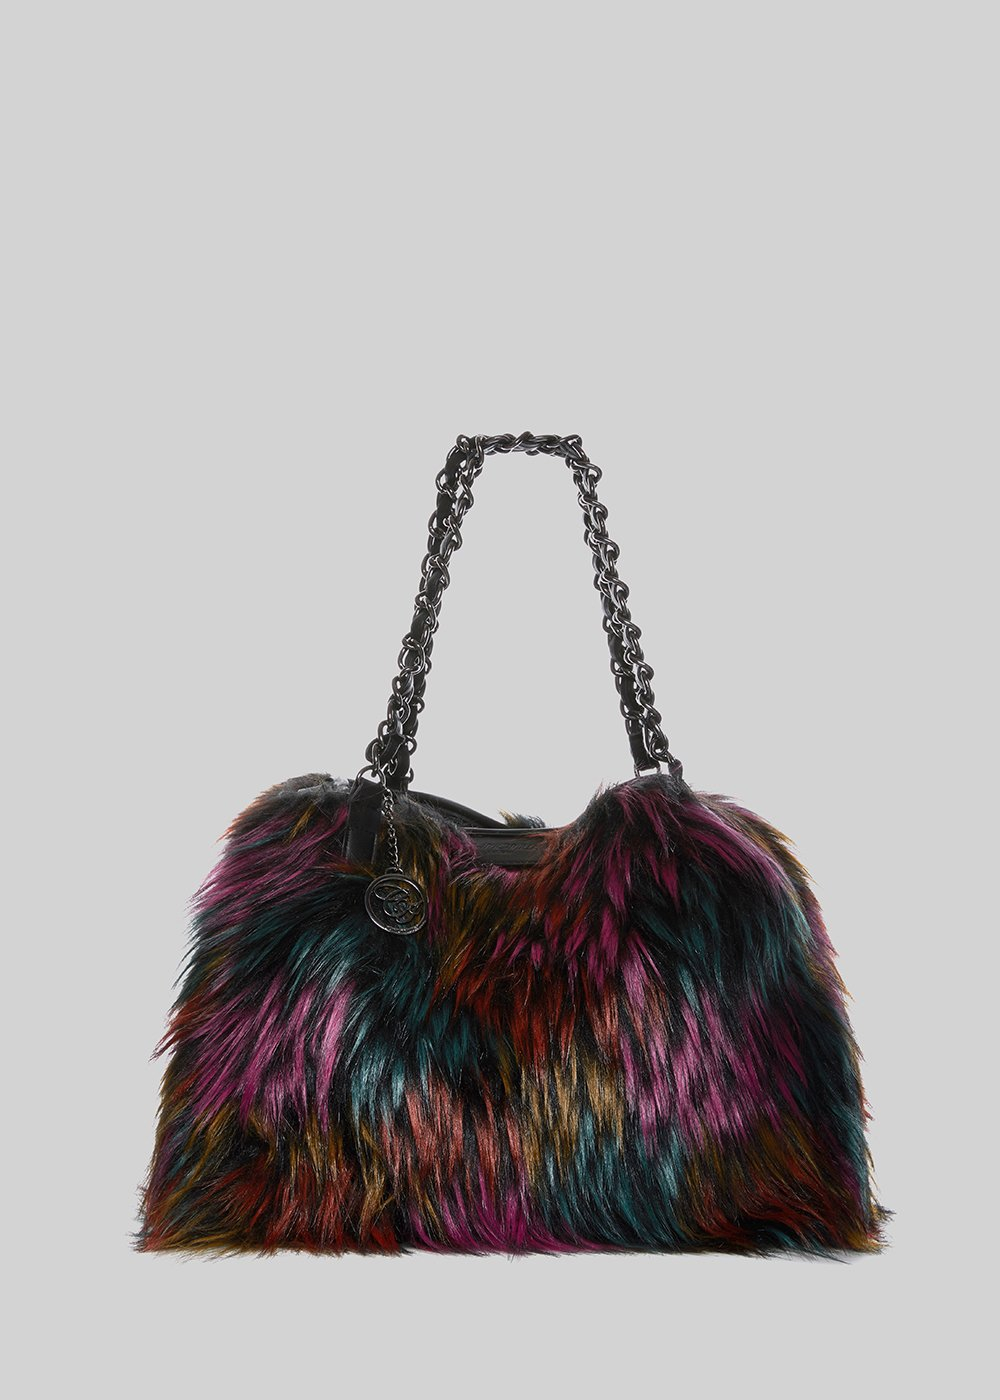 Fake fur multicolor bag Favolosa with chain handles - Black Fantasia -  Woman - Category image f39dff2c6c839